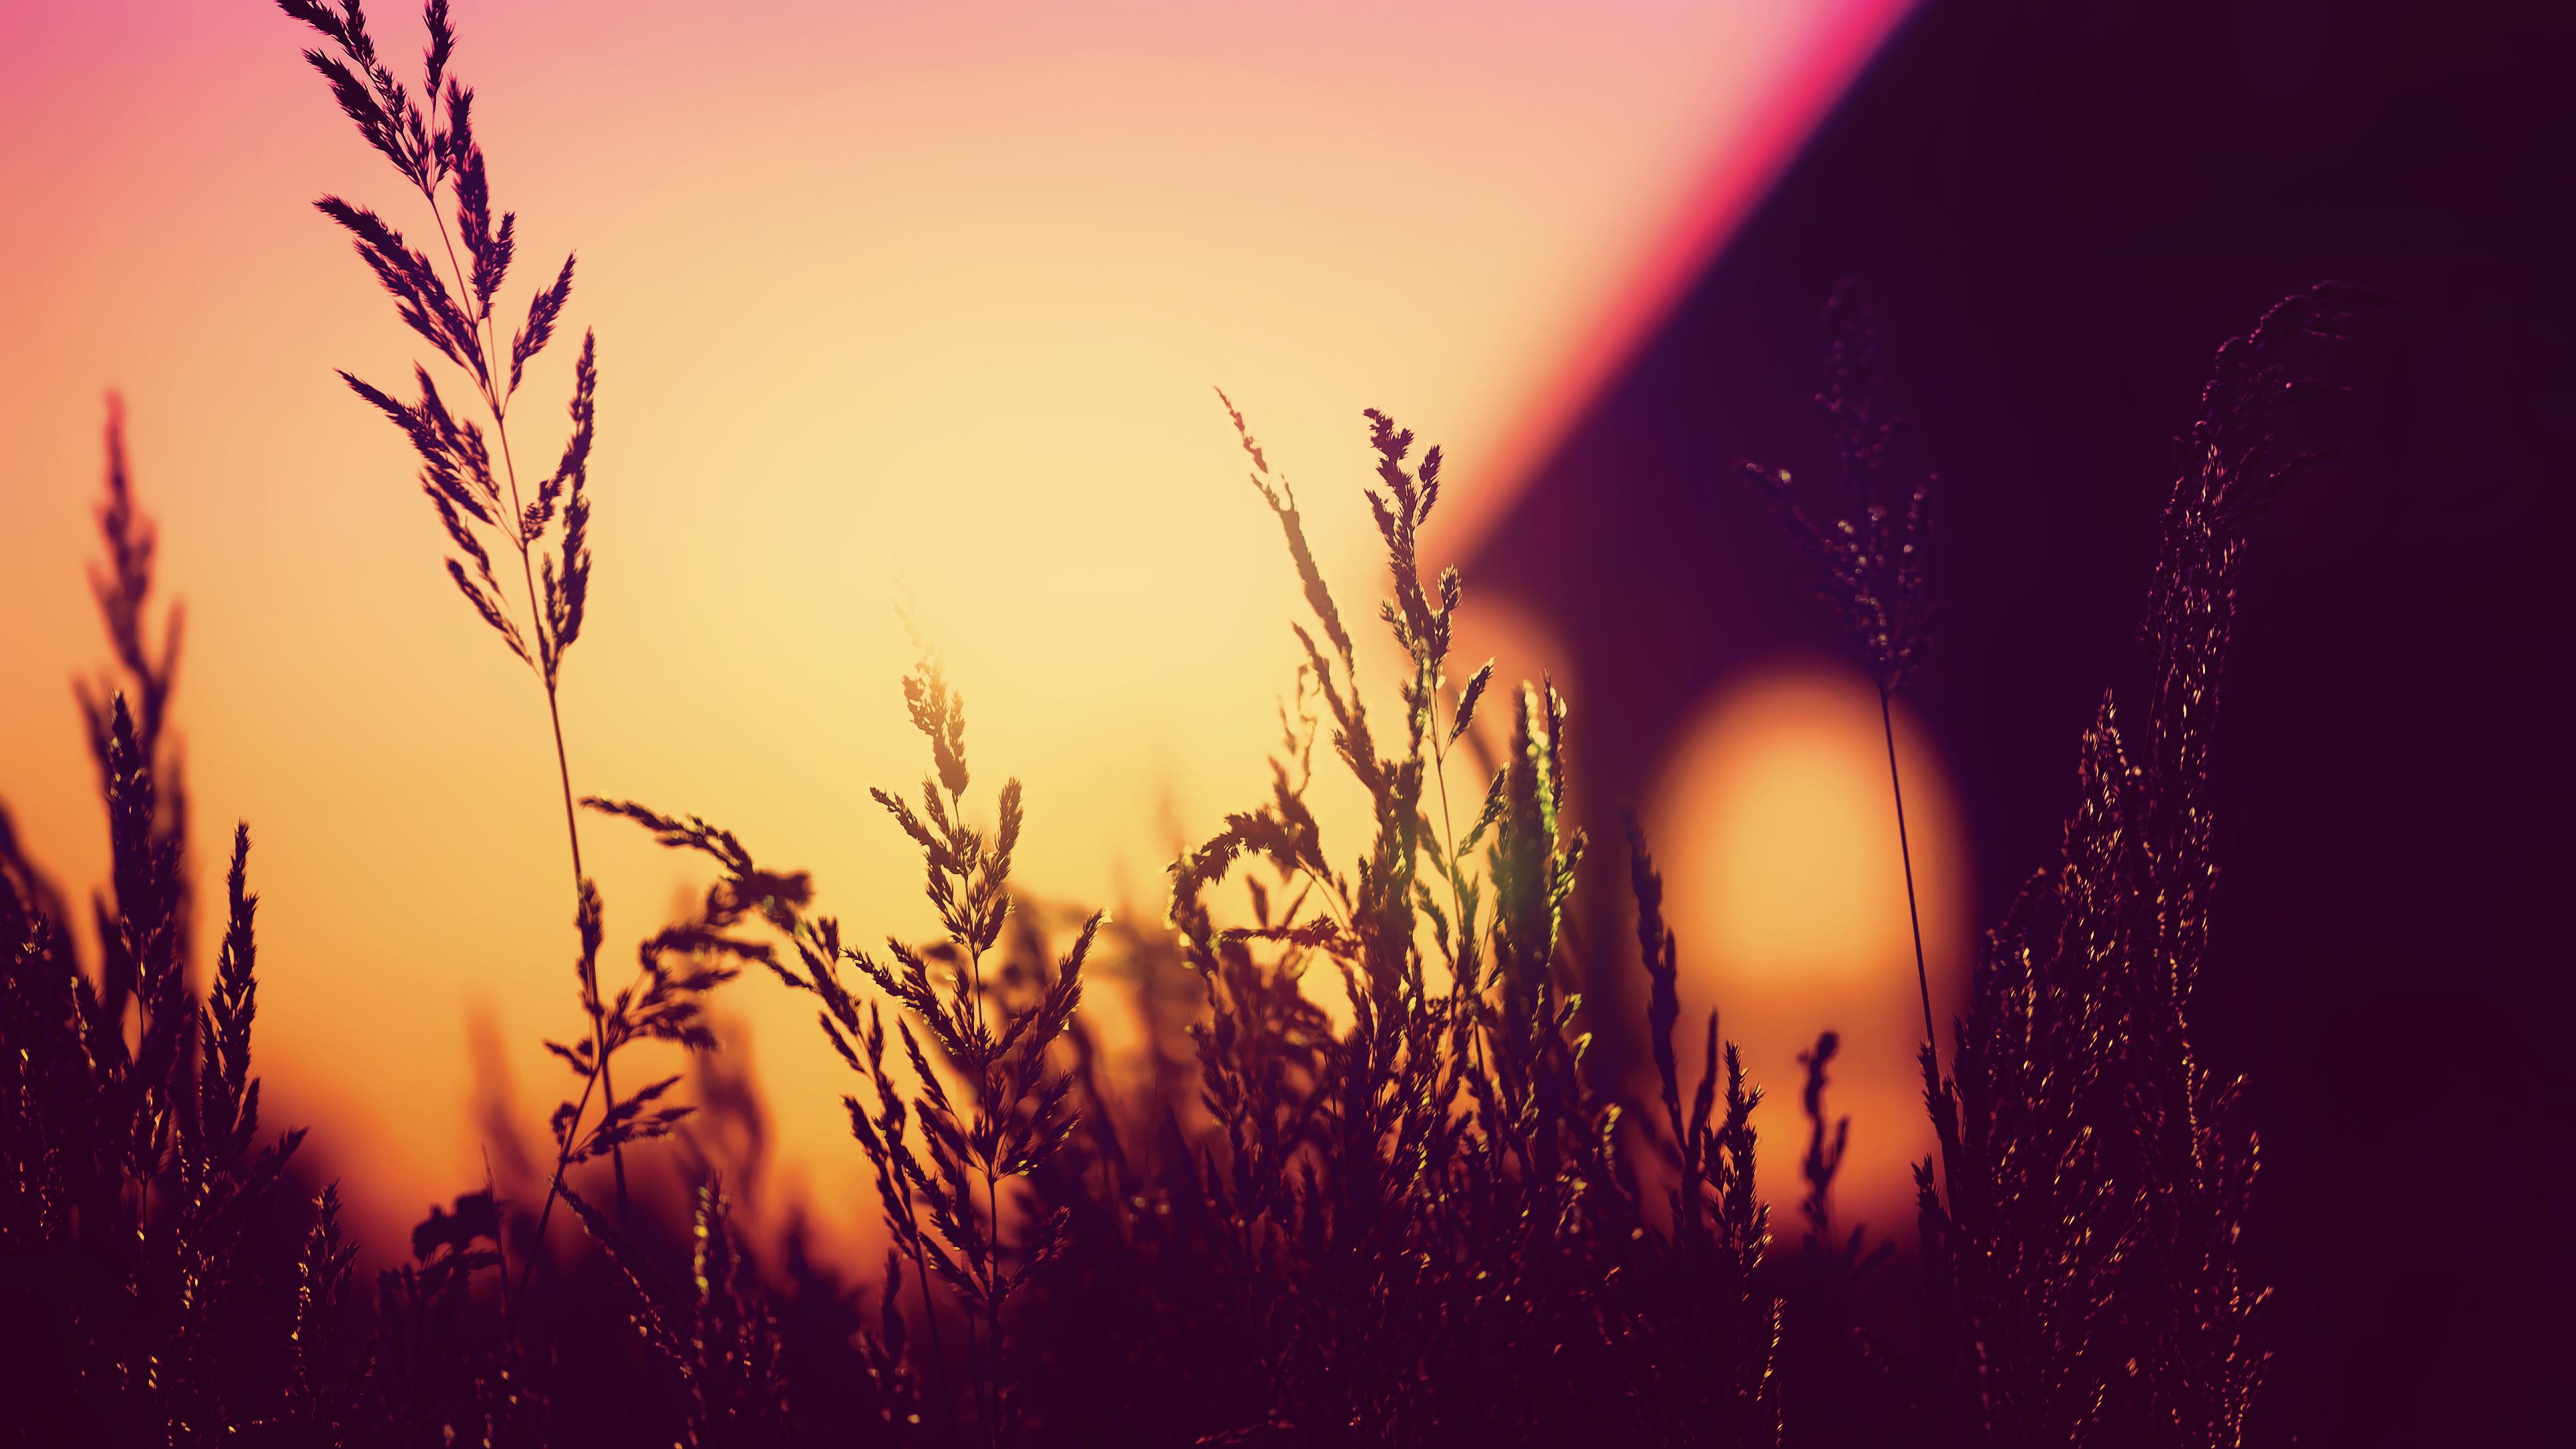 plants blurred silhouette sunset 4k 1551643354 - Plants Blurred Silhouette Sunset 4k - sunset wallpapers, silhouette wallpapers, photography wallpapers, nature wallpapers, hd-wallpapers, blur wallpapers, 4k-wallpapers